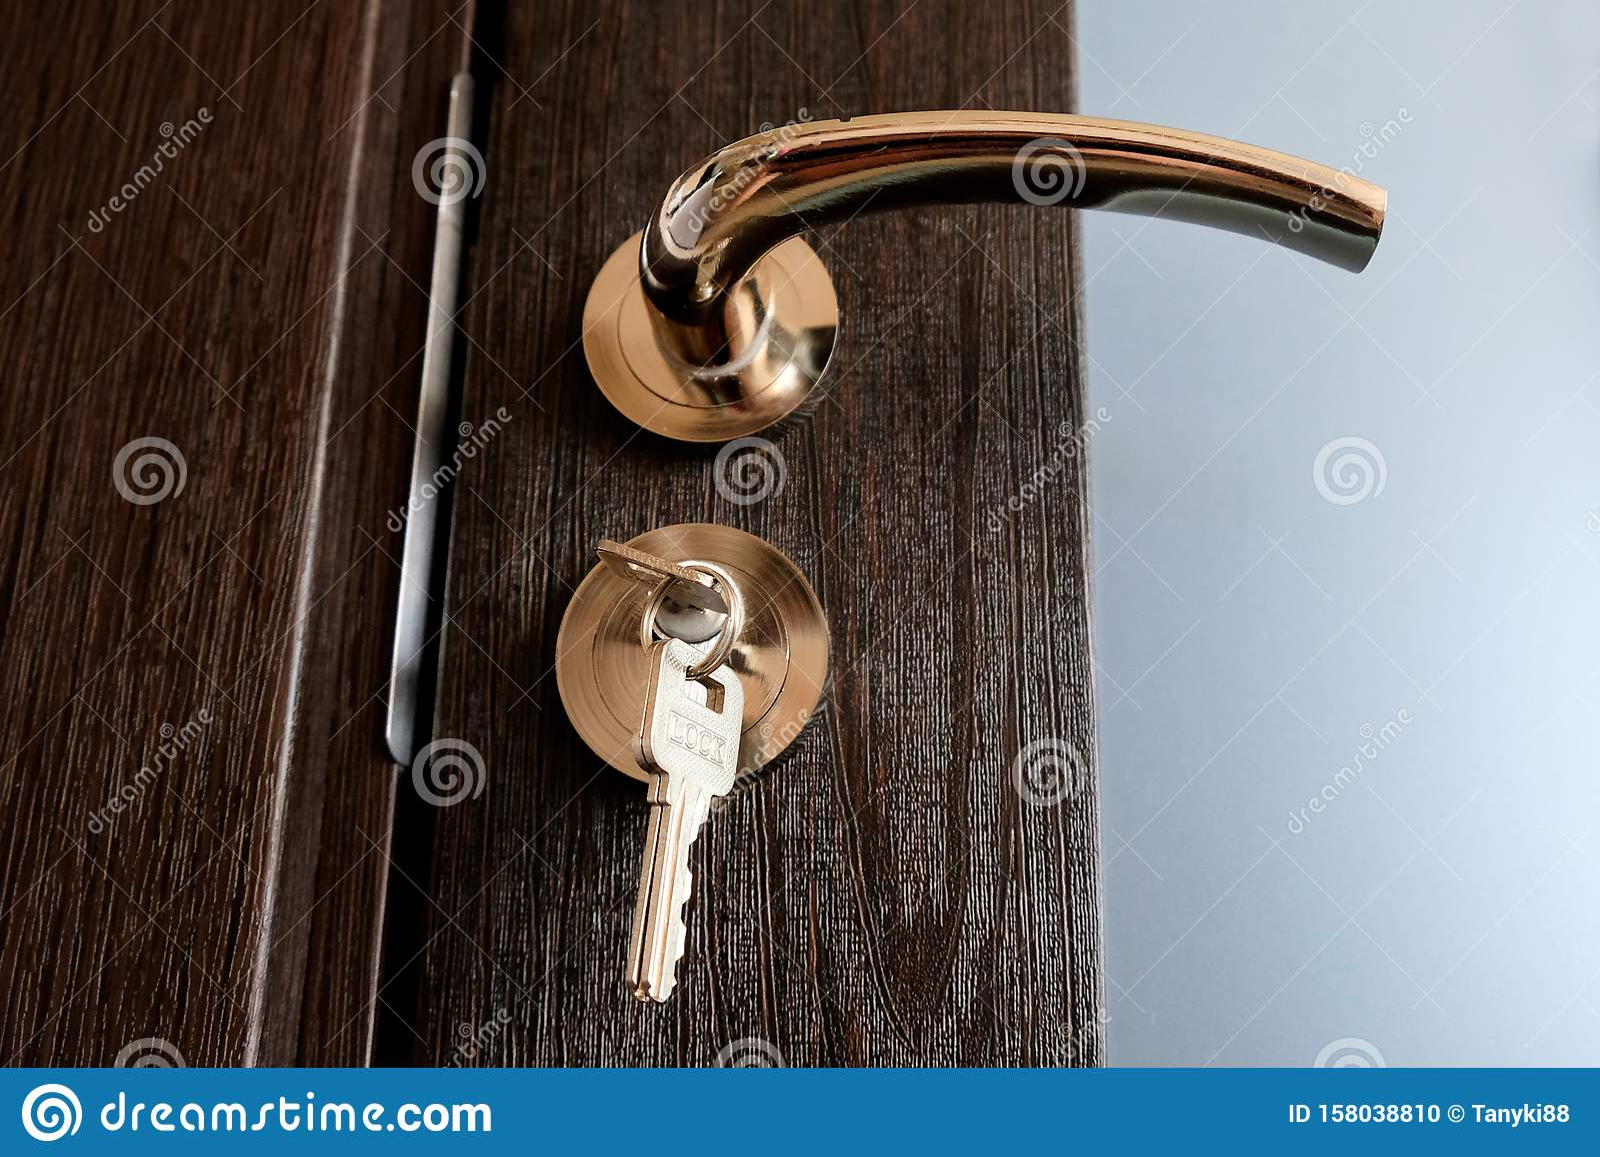 Yellow Metal Chrome Door Handle And Lock With Keys Stock Photo Image Of Gate Doorway 158038810